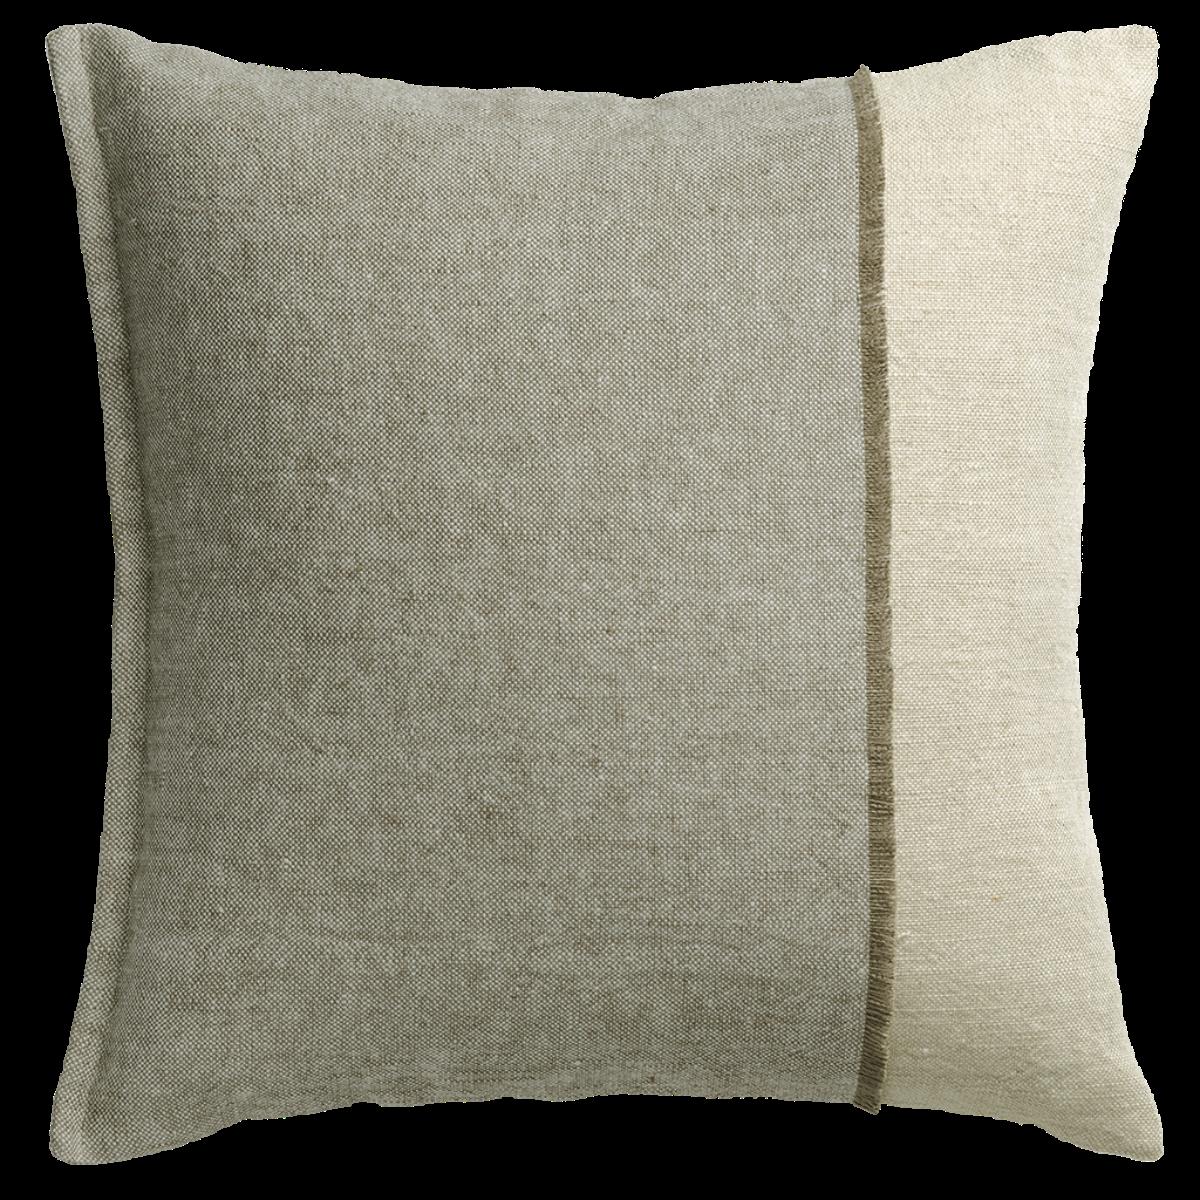 de Le Cuona | Haiku Panel Cushion With Fringe Detail Pond/Husk